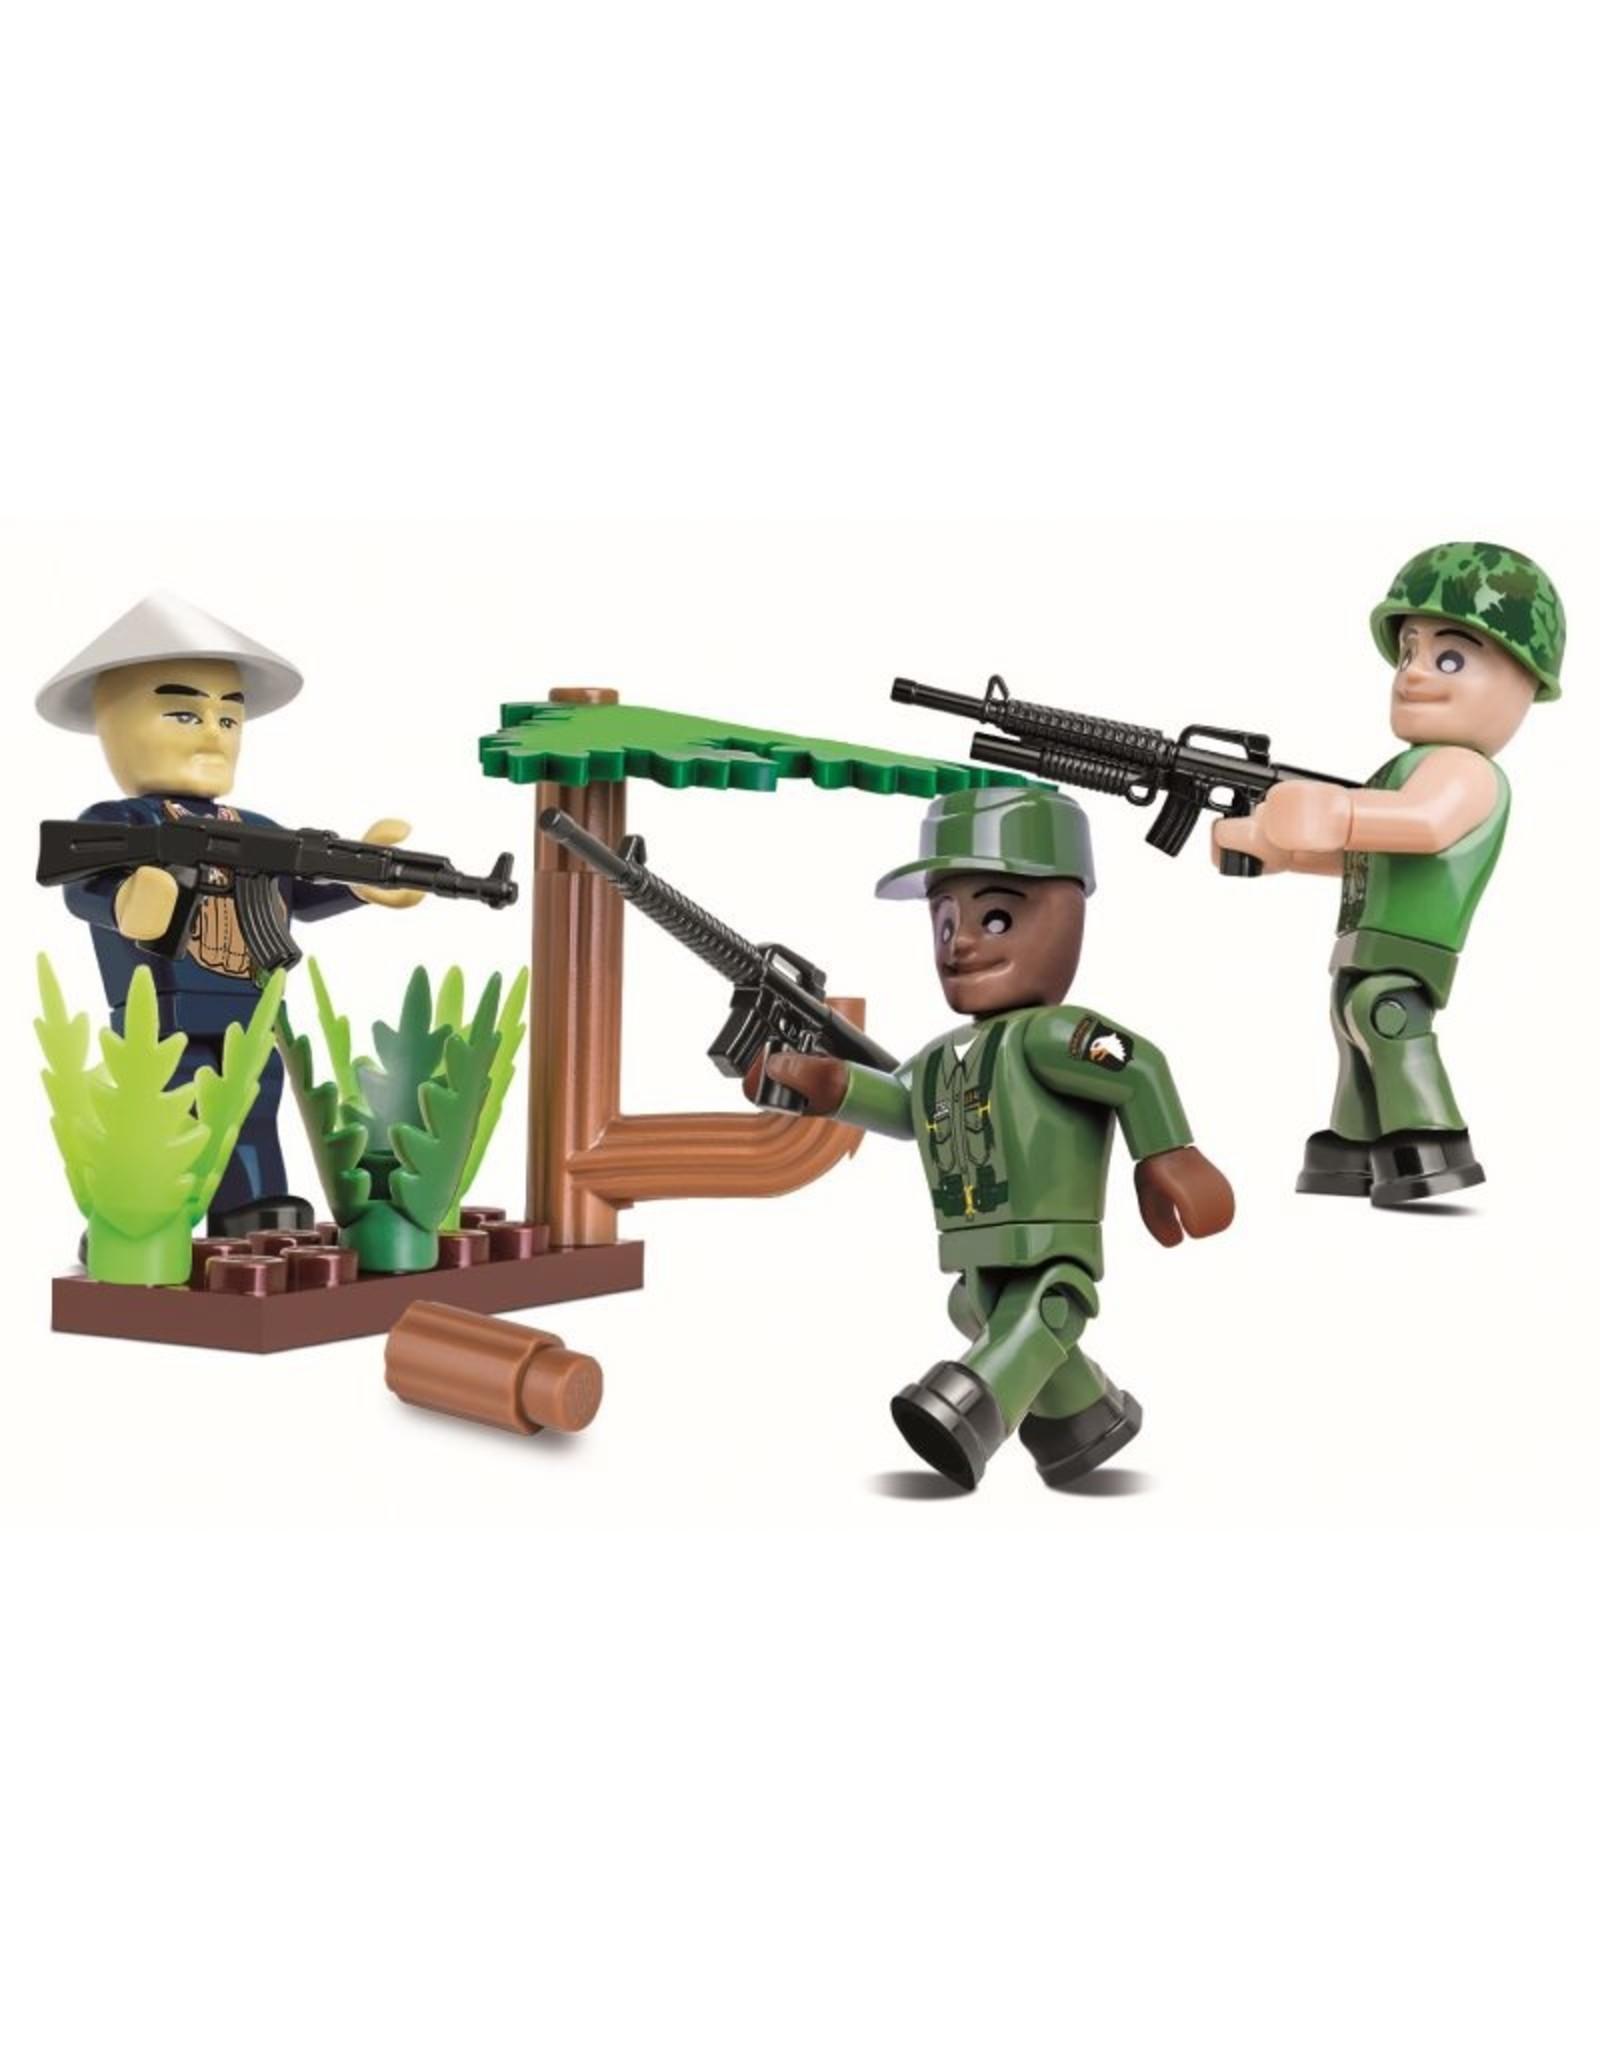 COBI COBI 2038 - Figures Vietnam War